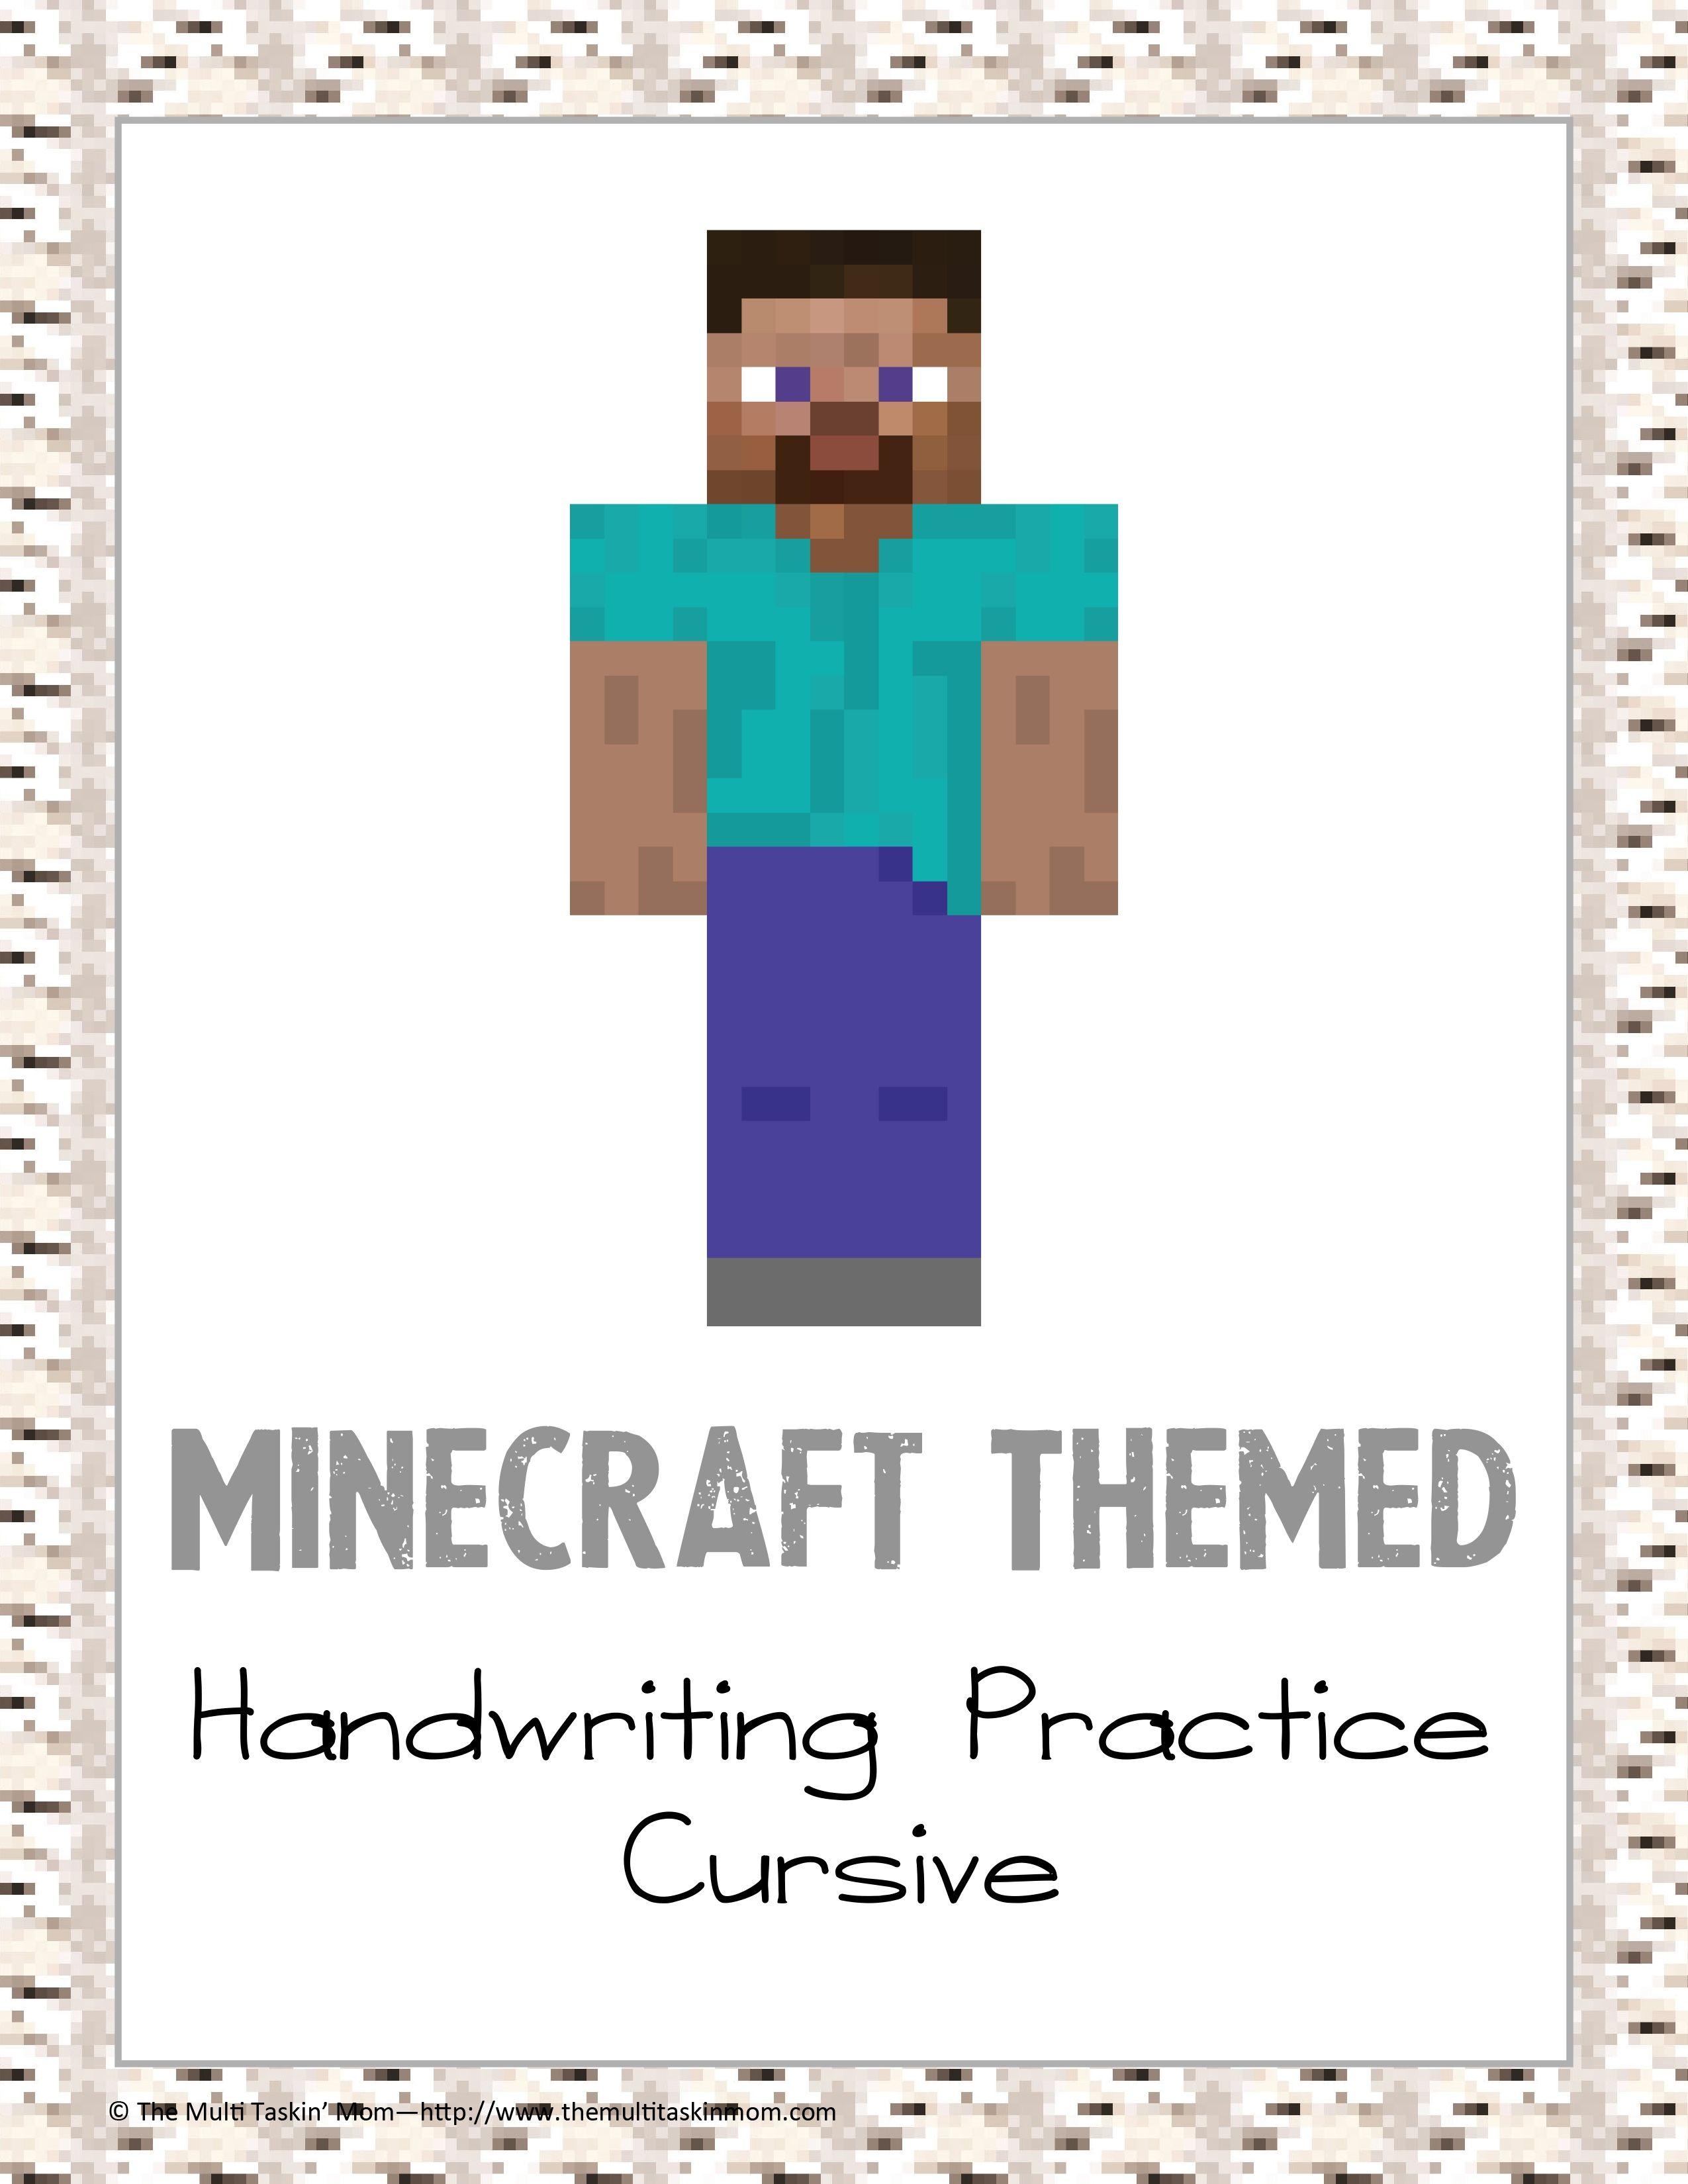 Minecraft Cursive Handwriting Practice Cursive Handwriting Cursive Handwriting Practice Handwriting Practice [ 3300 x 2550 Pixel ]